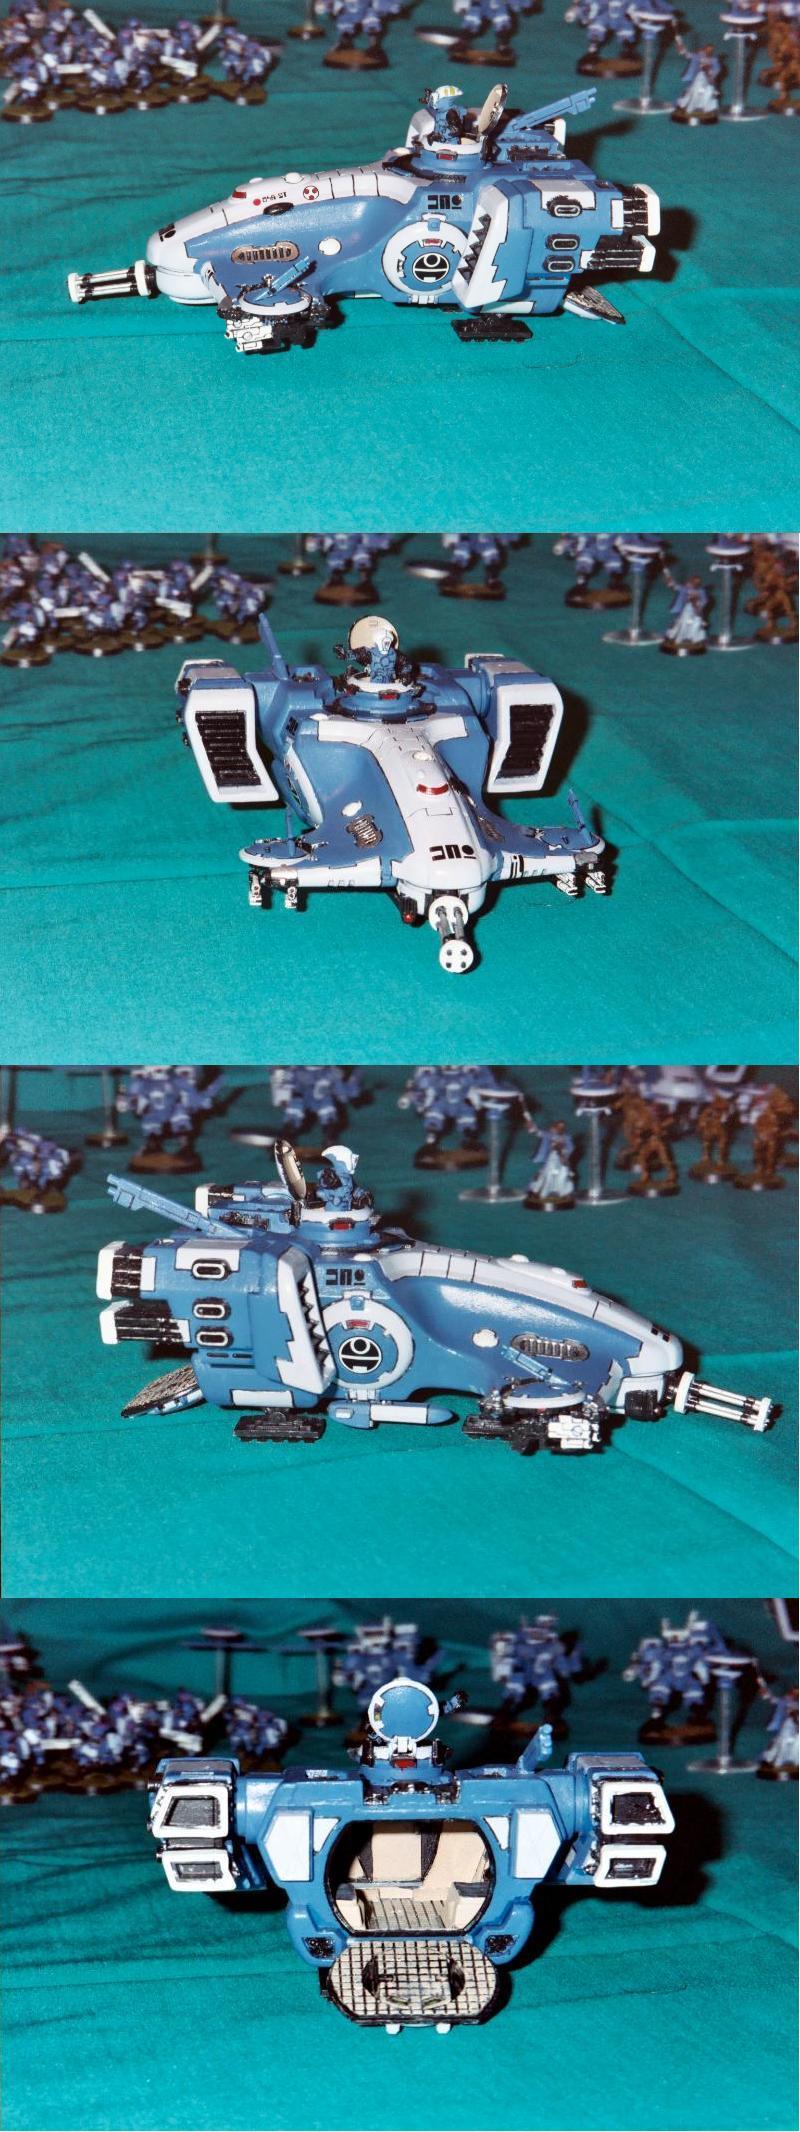 Blue, Burst Cannon, Devilfish, Skimmer, Tau, Transport, Warhammer 40,000